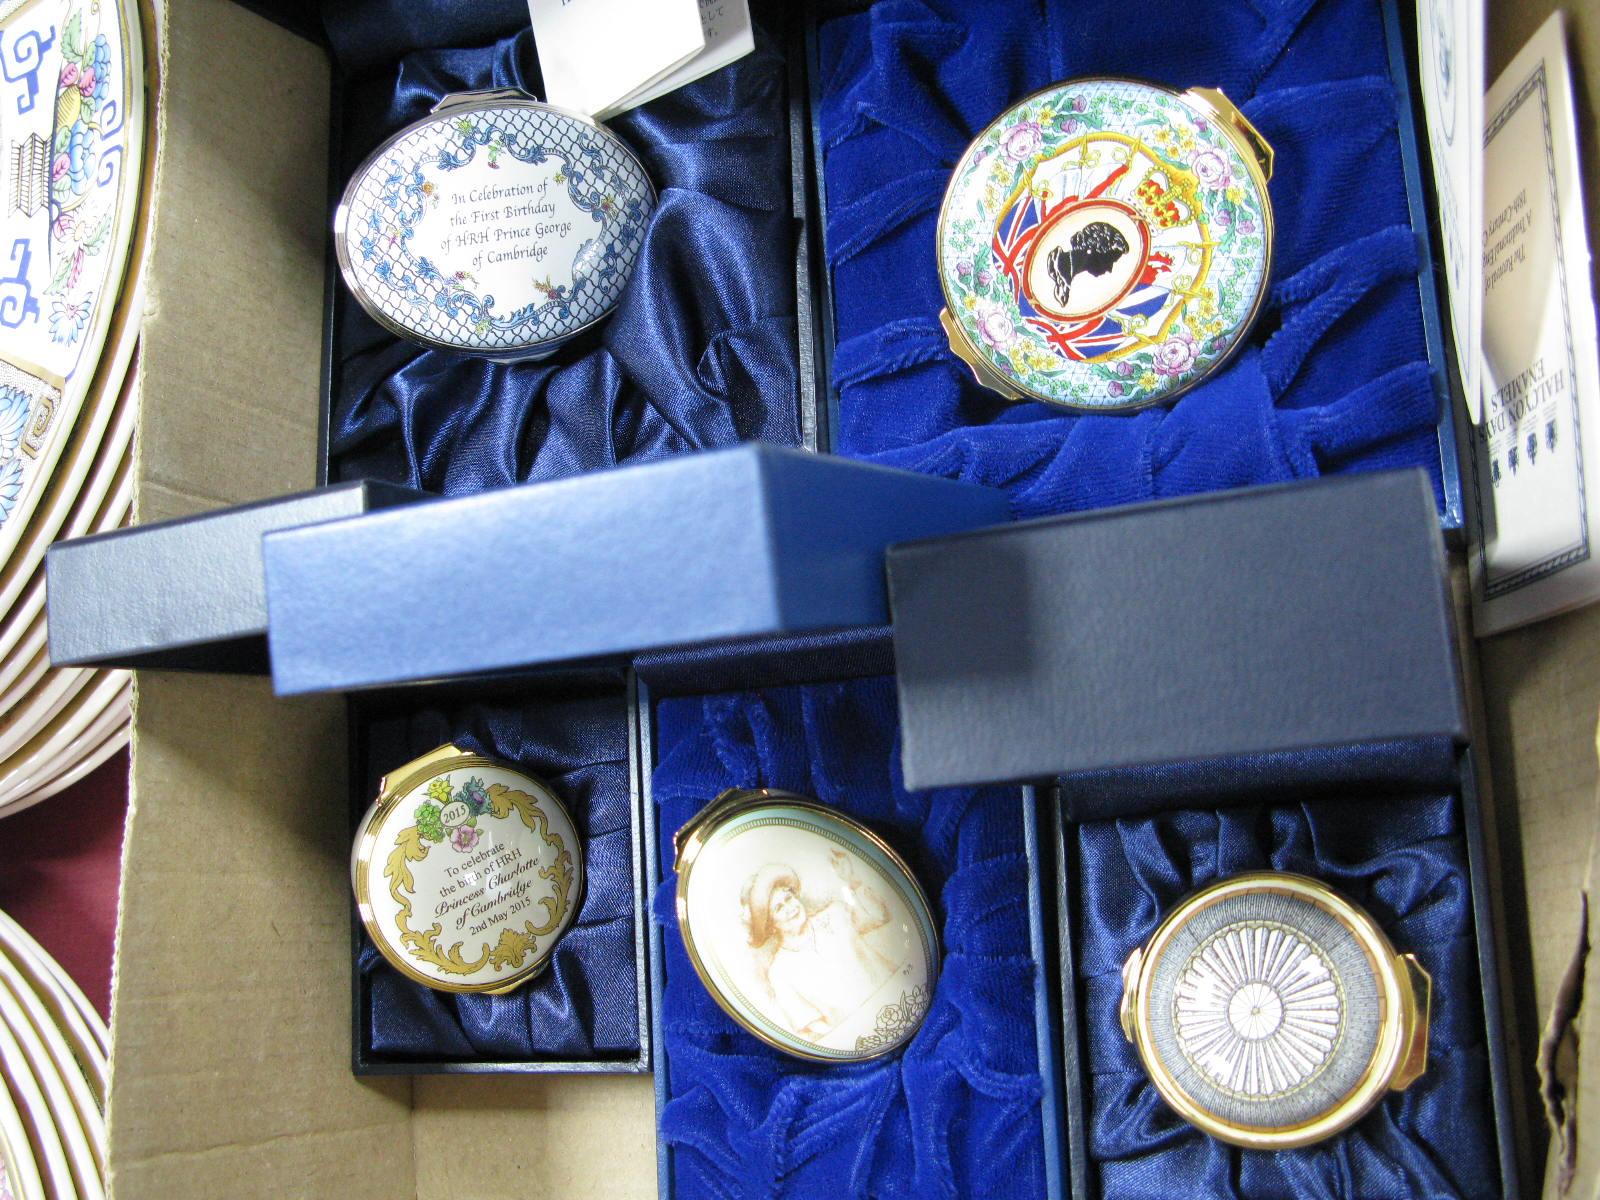 Lot 9 - Halcyon Days Enamelled Trinket Boxes, Golden Jubilee, Floral, Queen Mother, Charlotte, George,